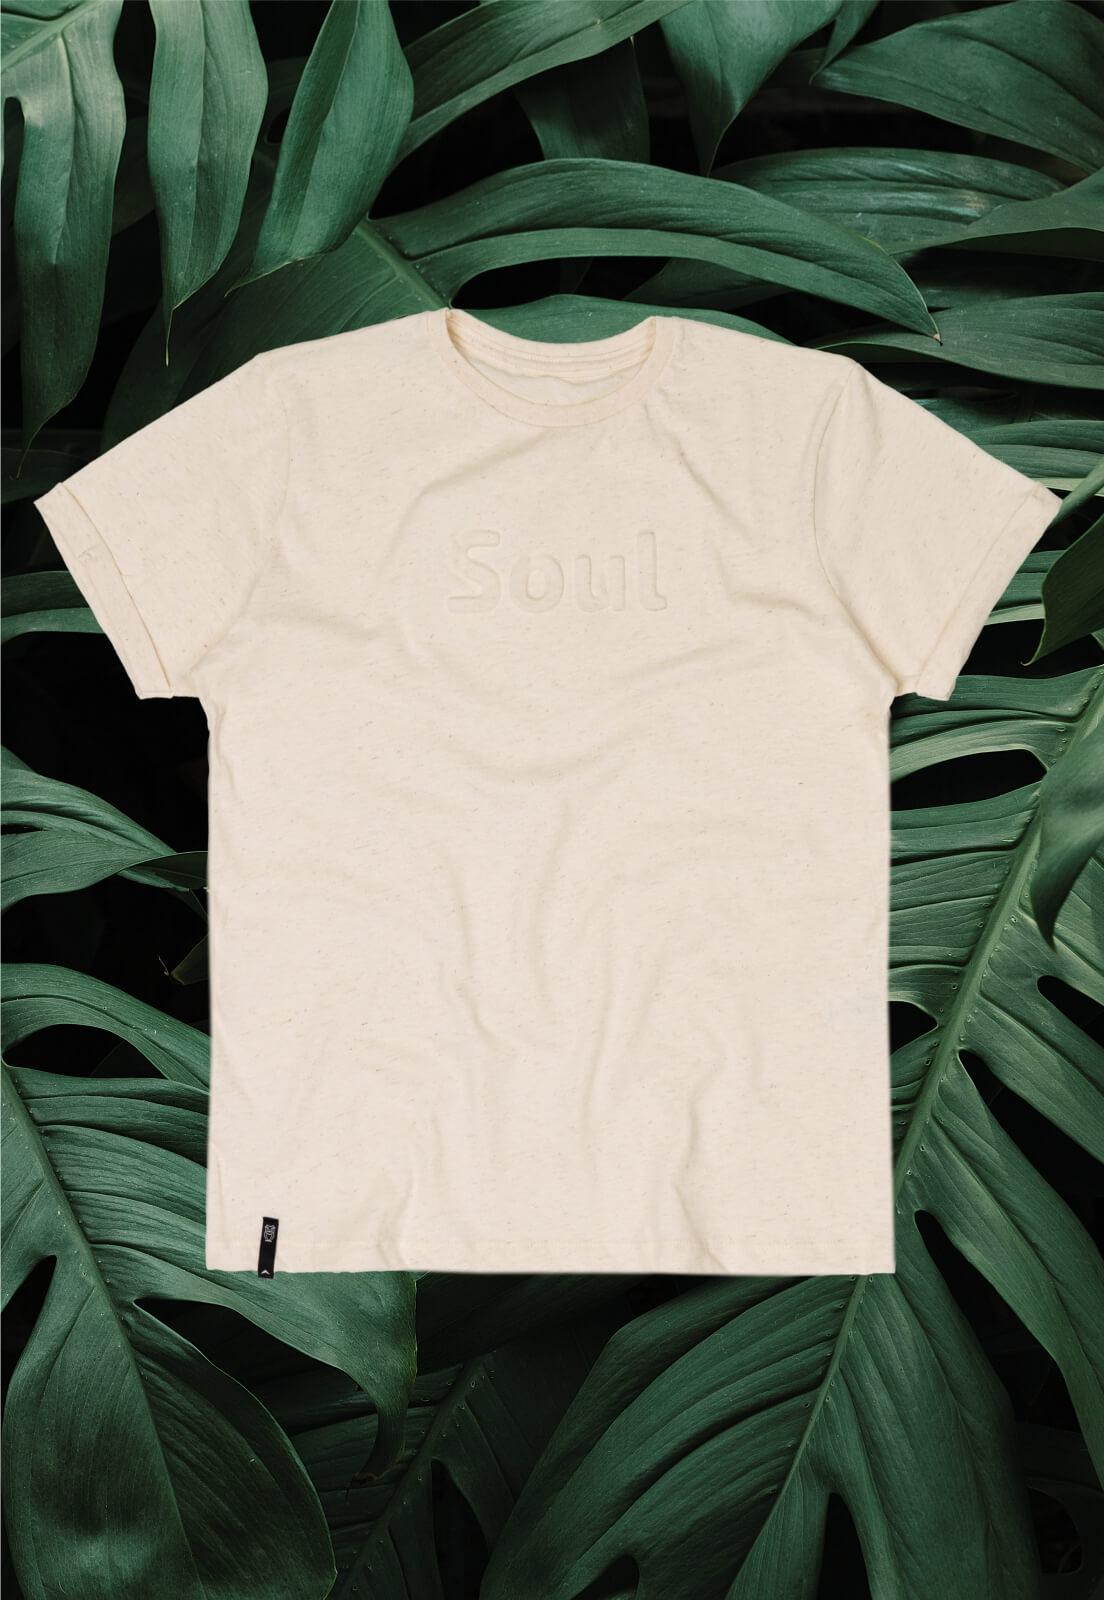 T-shirt Nogah Soul